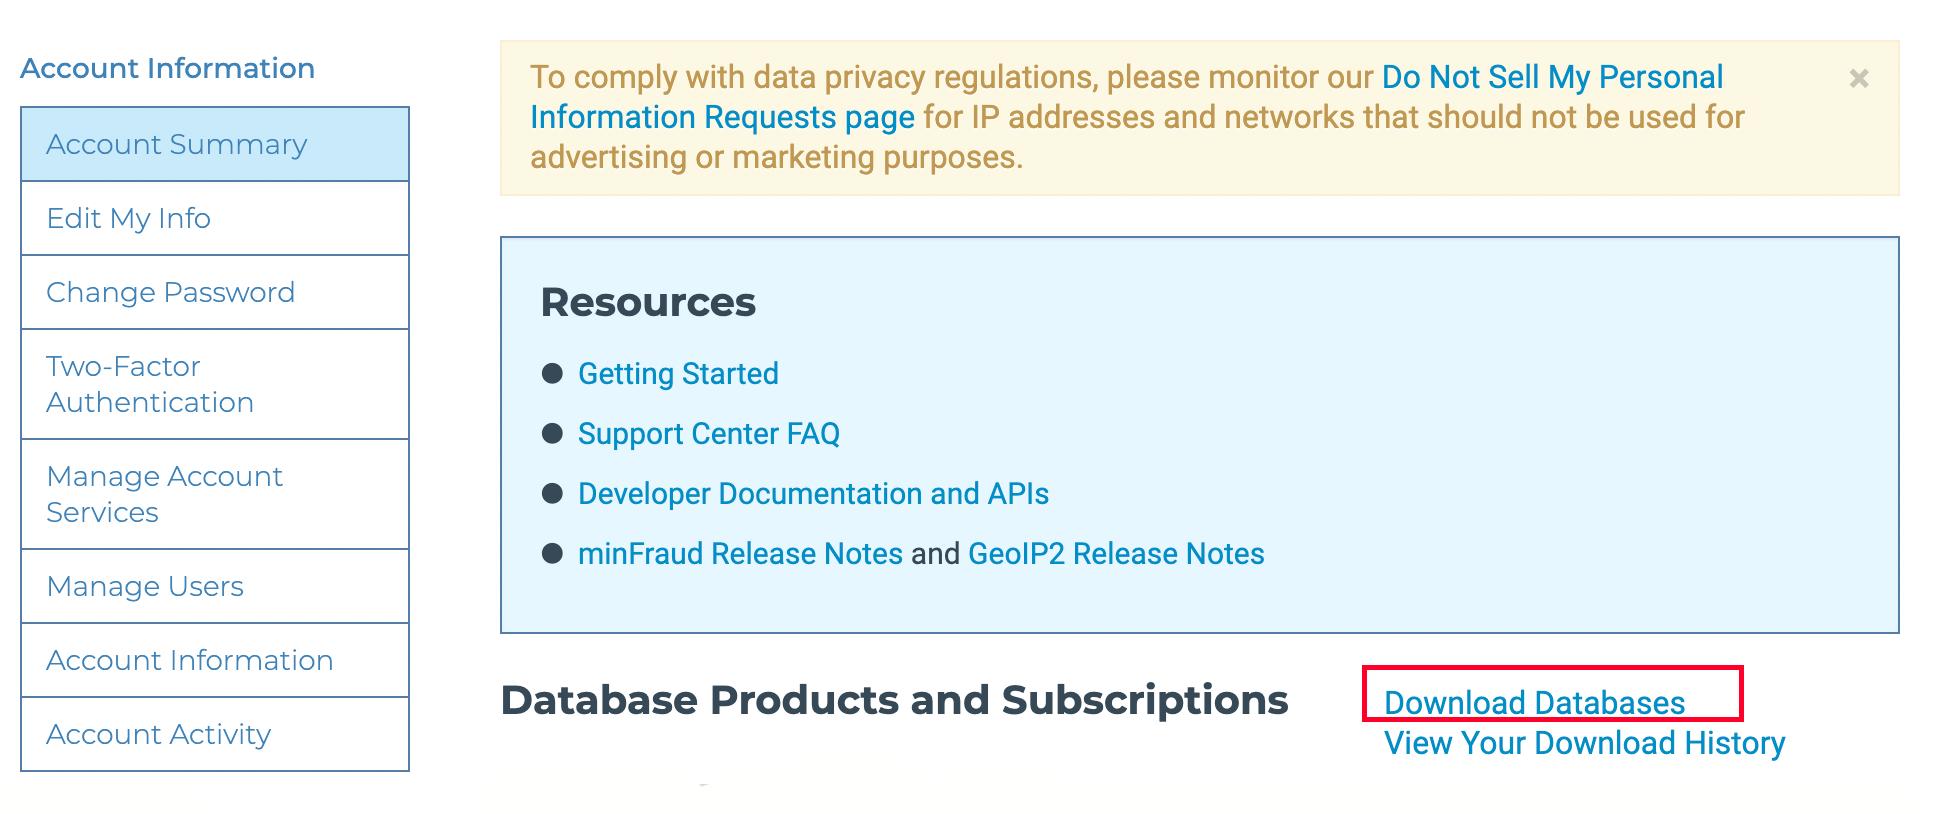 GeoLite2 - 注册并登陆账号门户/用户中心(account portal) - 点击 Download Databases .png